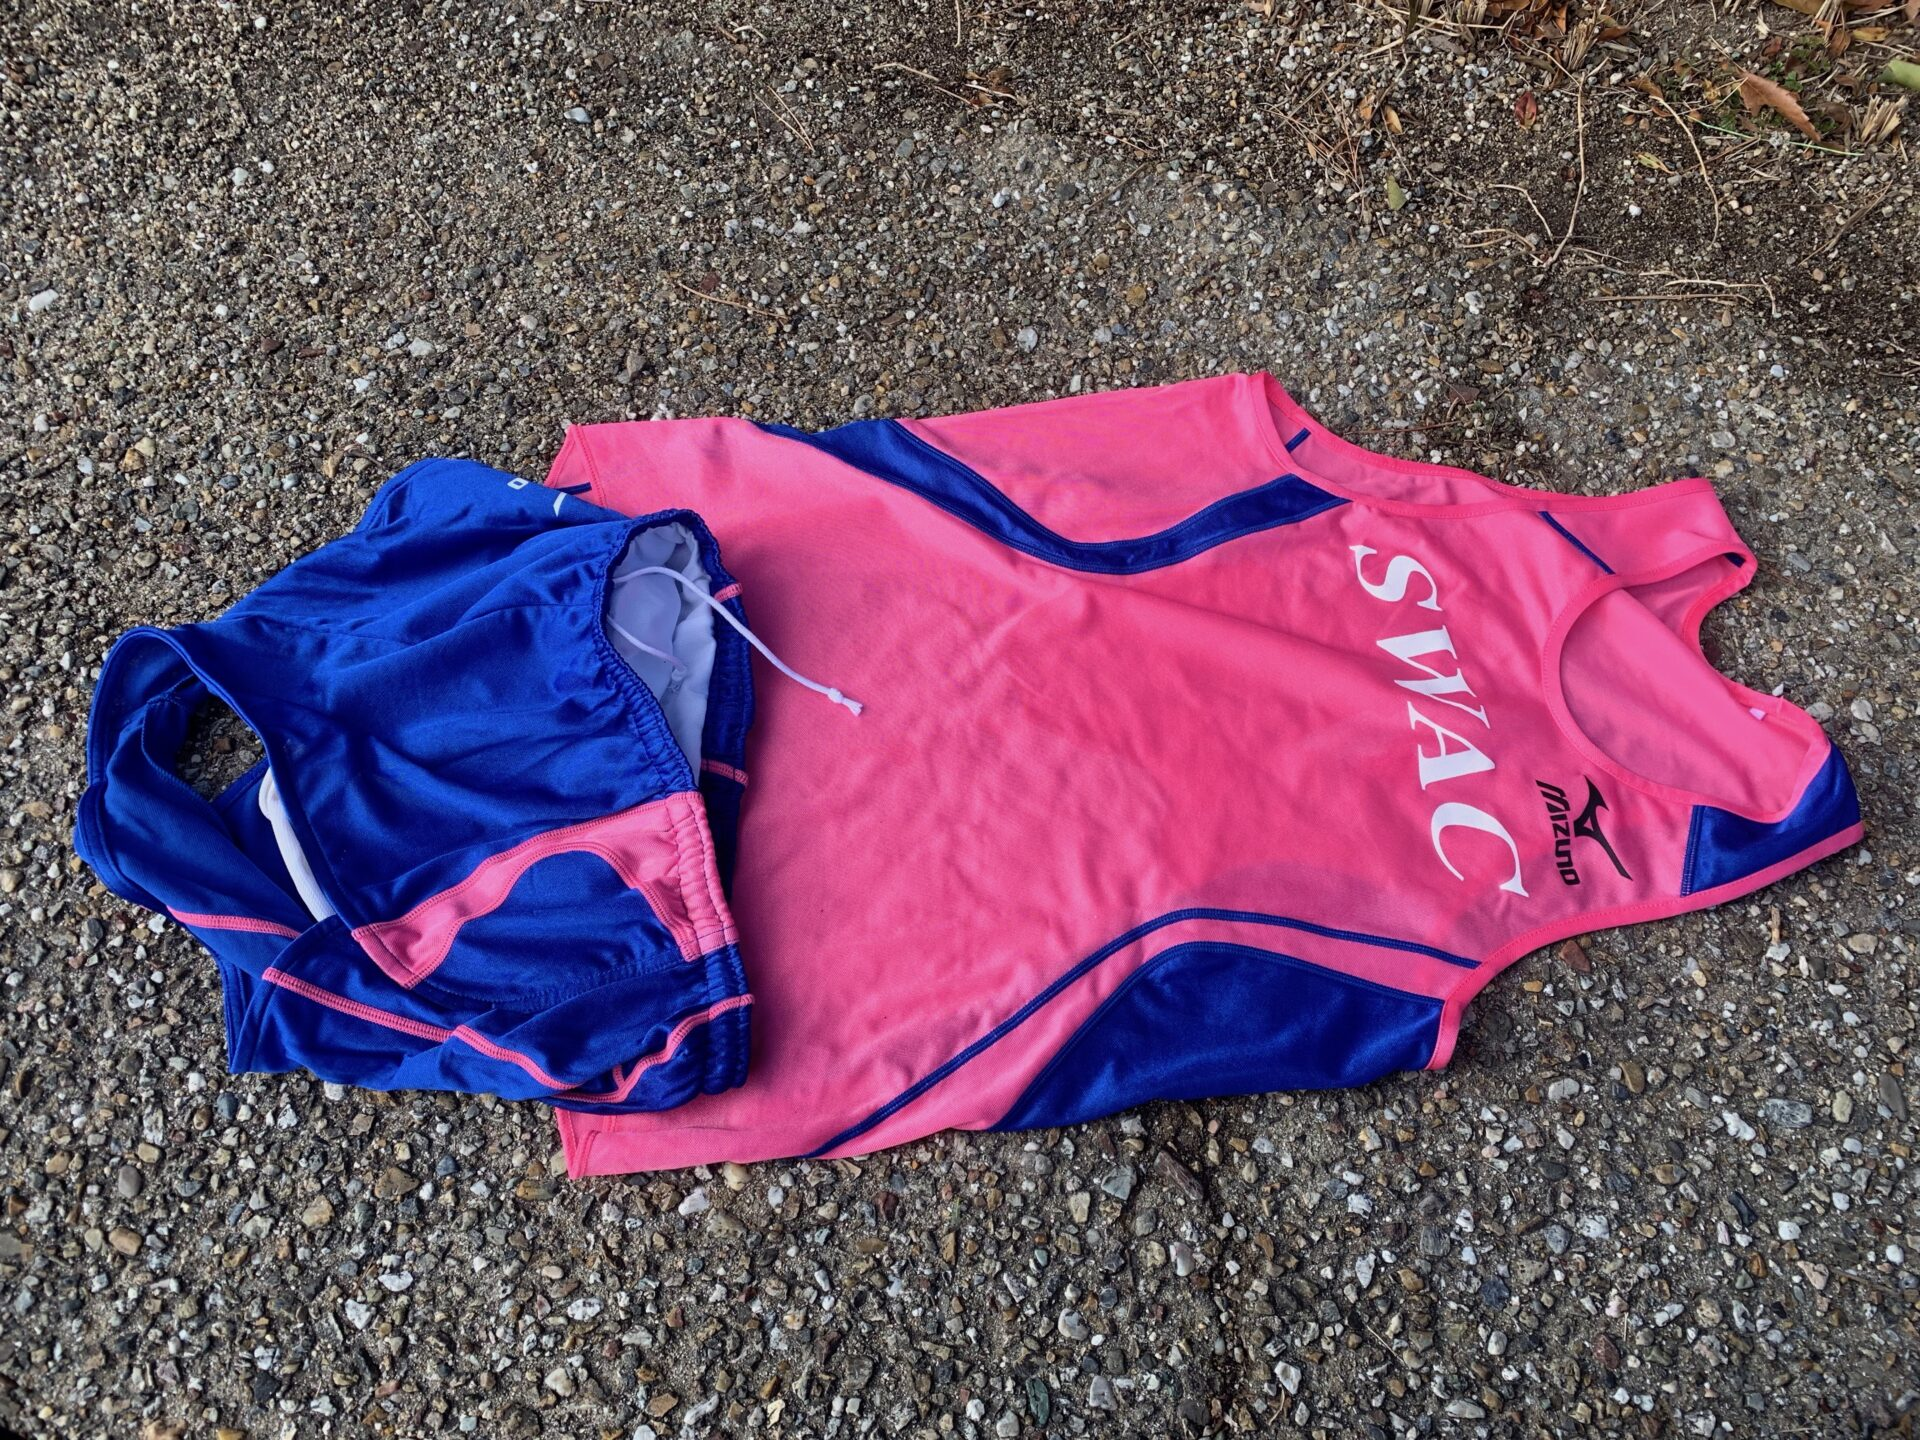 SWACユニフォームを初着用してマラソンレース1週間前の刺激入れ練習・3km+2km+1kmを実施